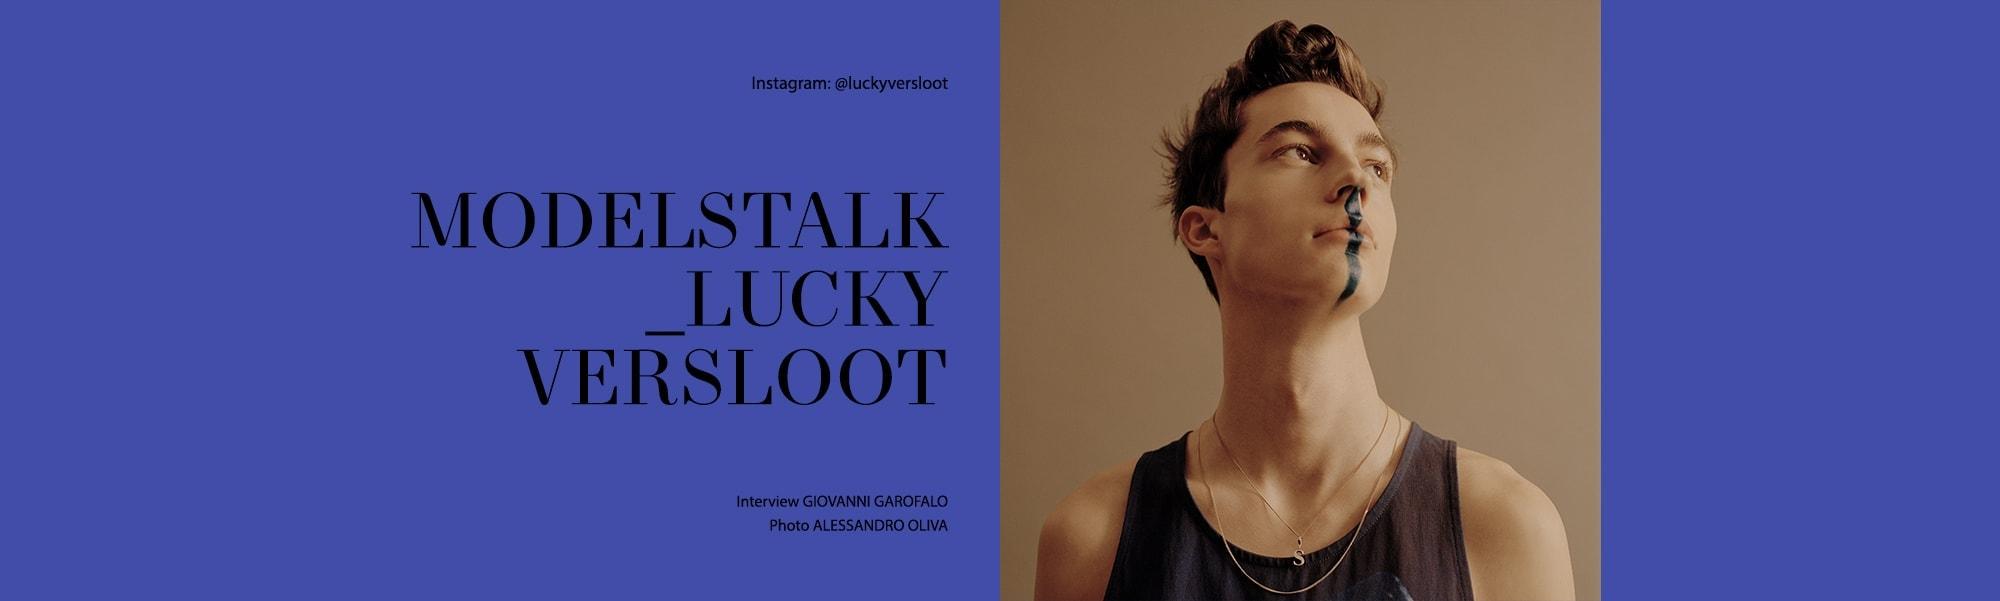 lucky-versloot-banner-landing-thegreatestmagazine-talking-heads